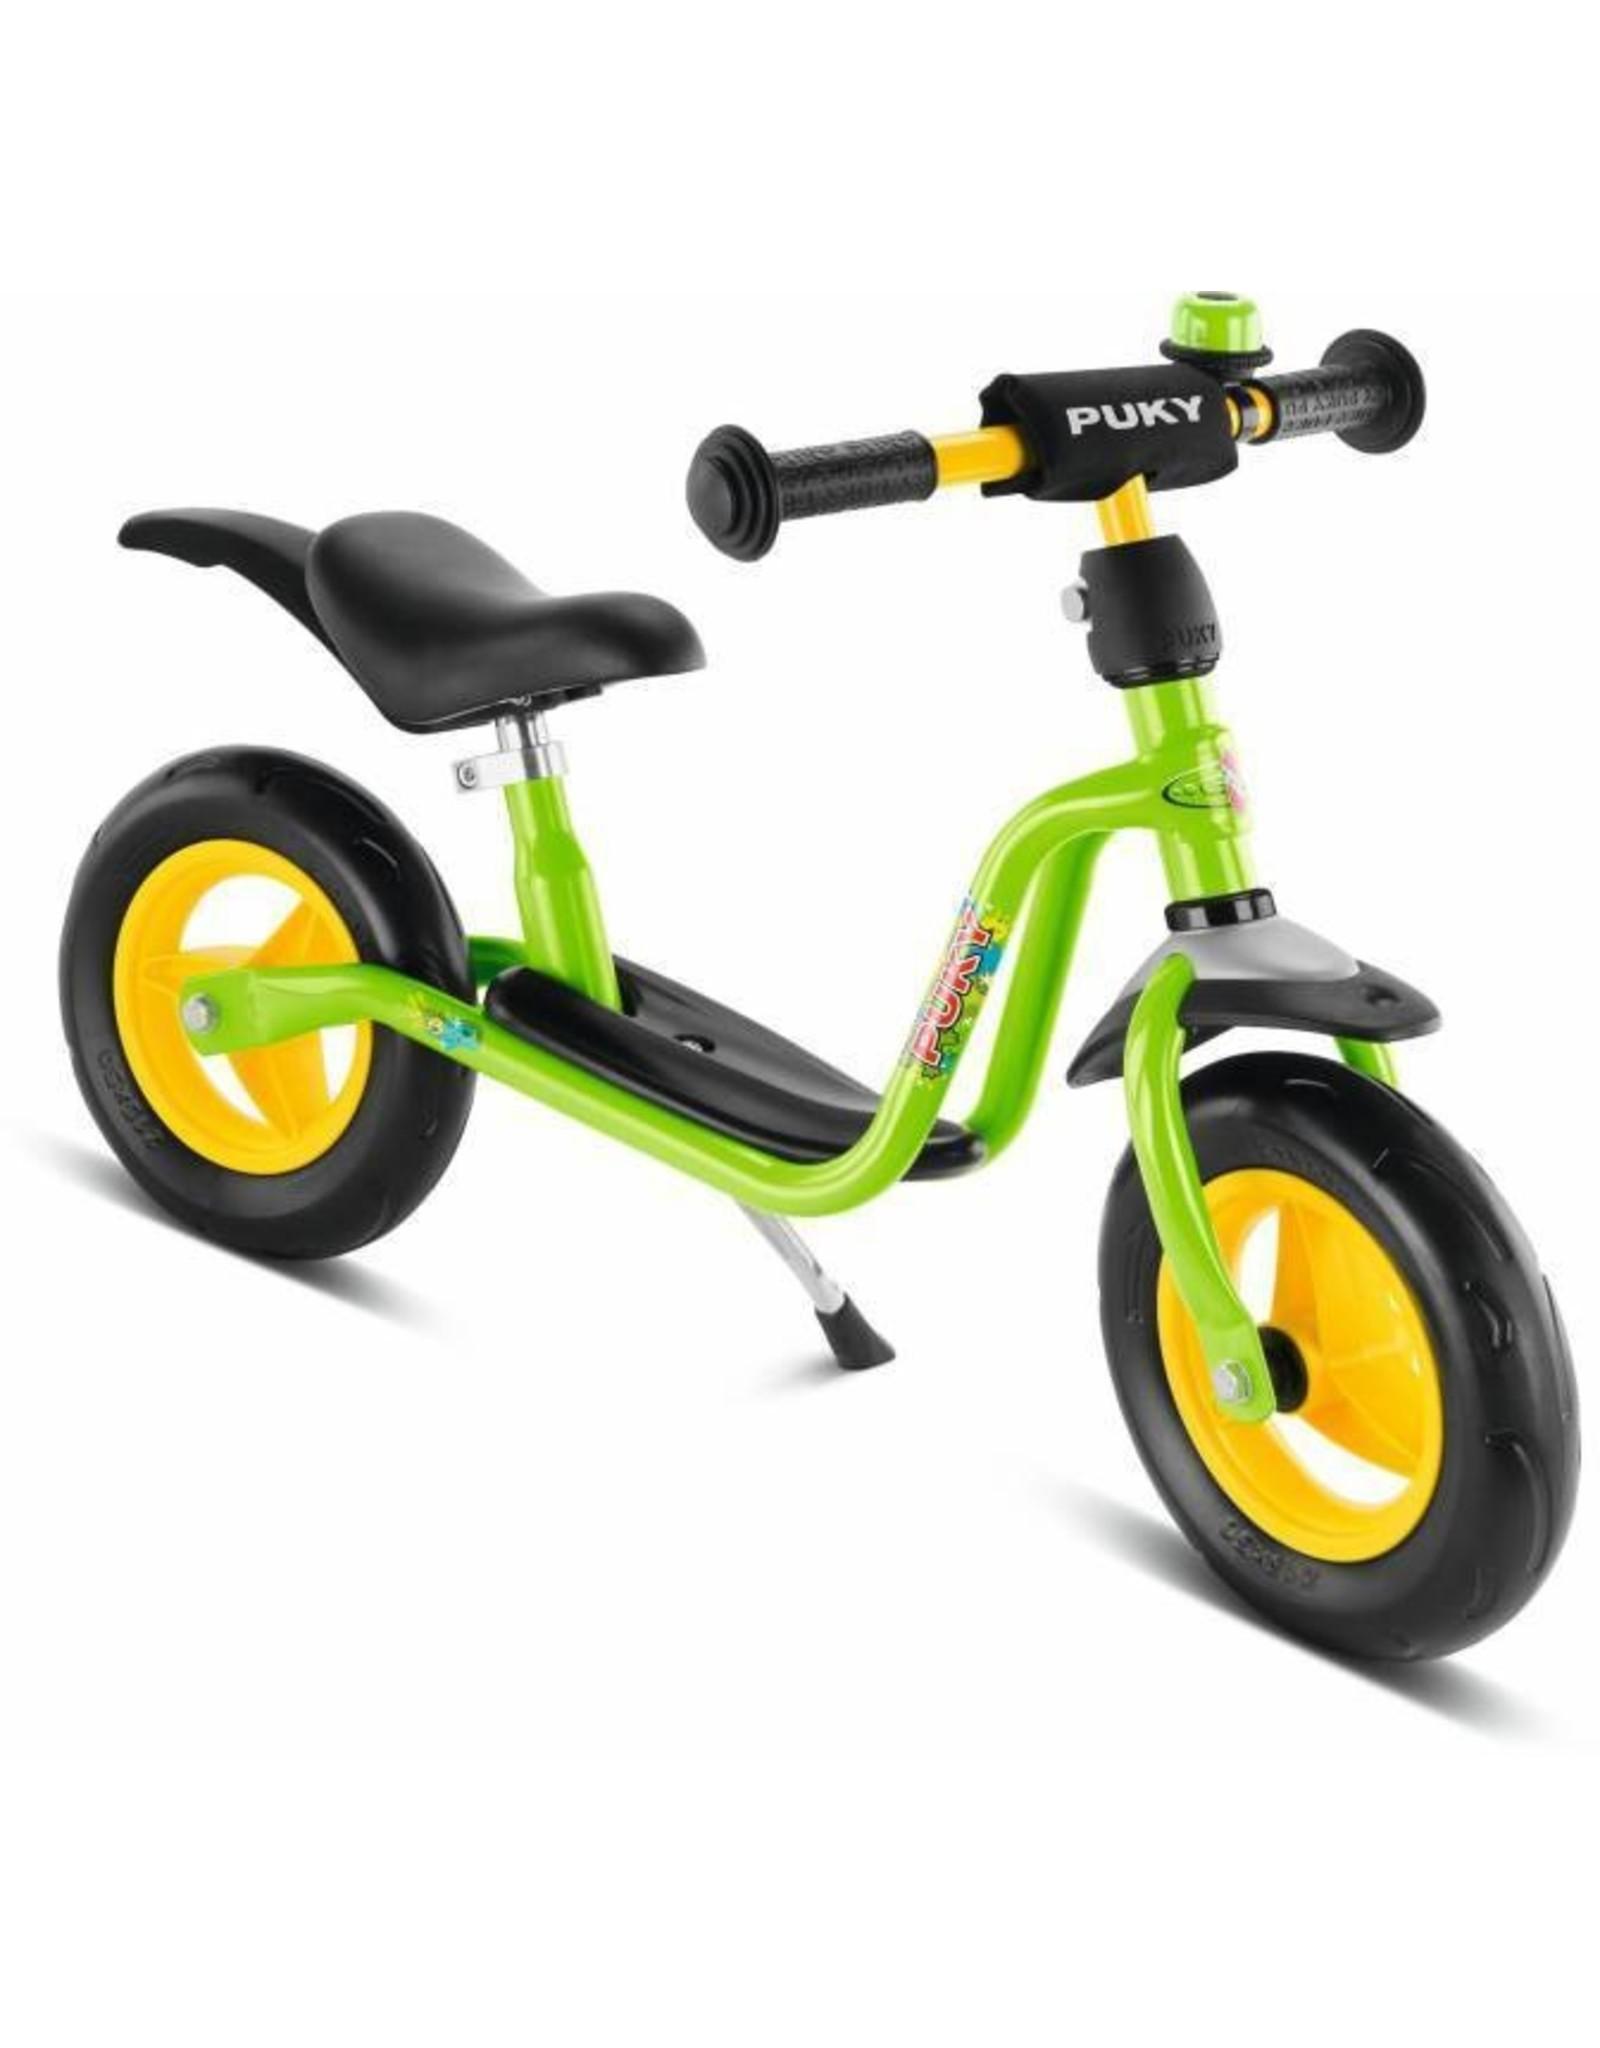 Puky Puky LRM Plus Loopfiets groen - Altoys